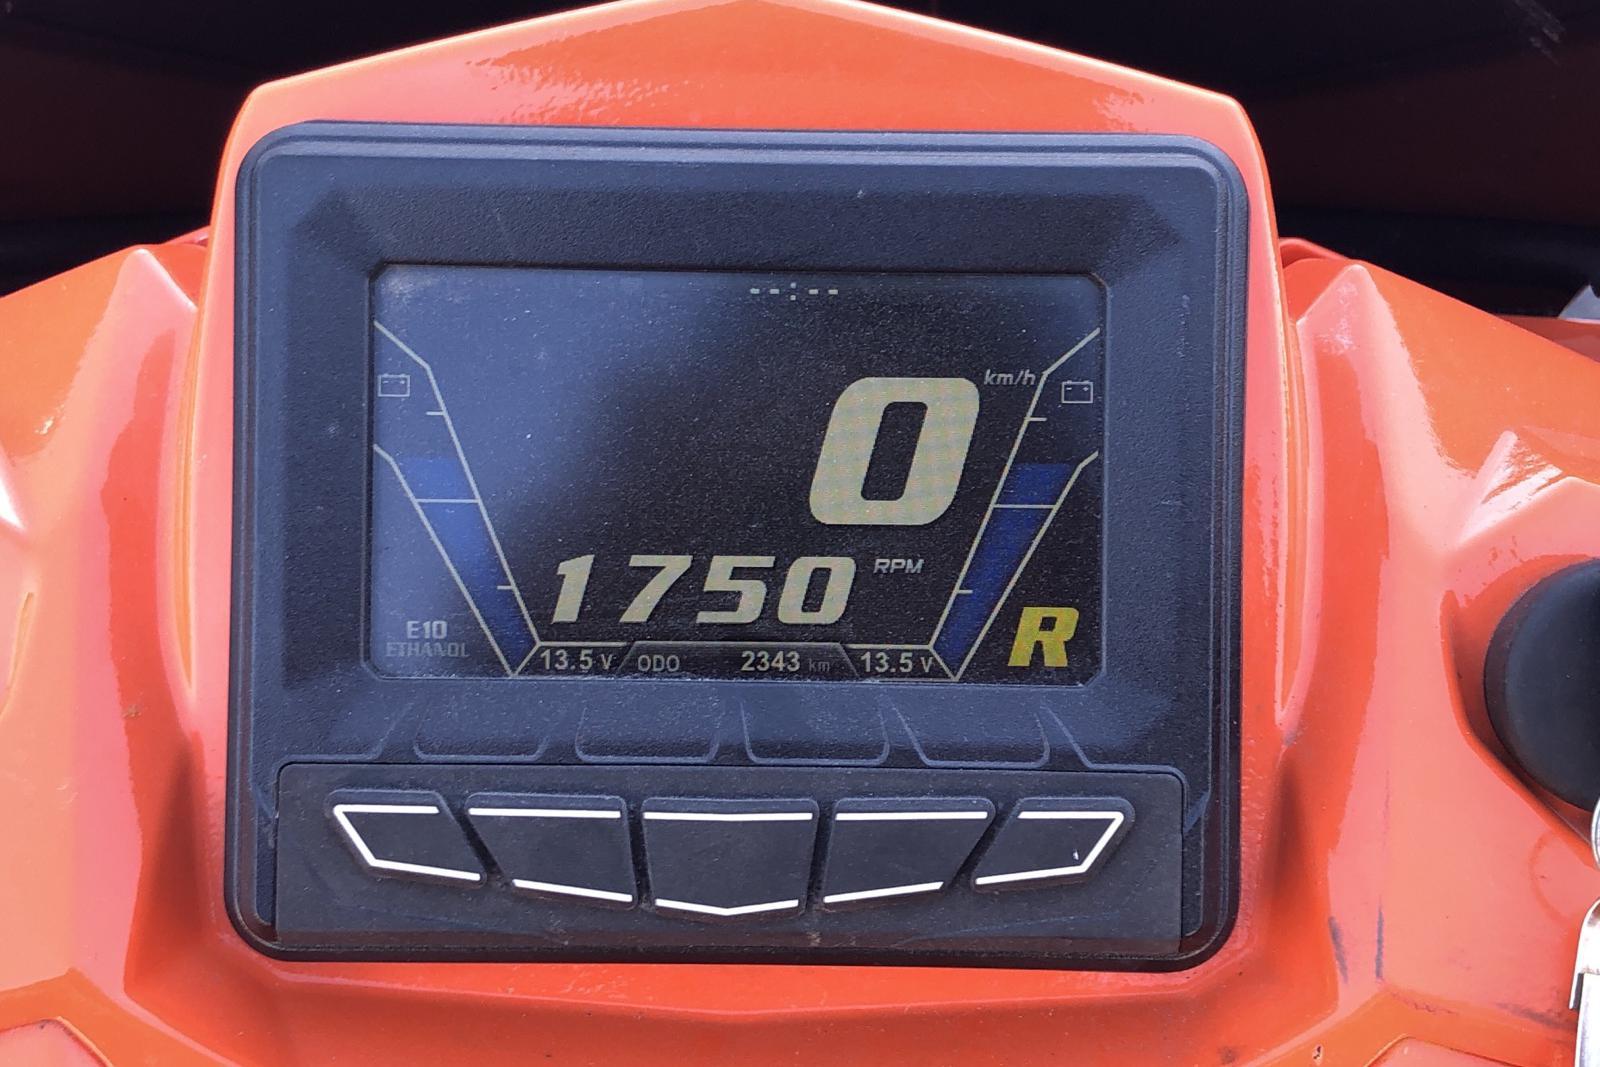 POLARIS 800 PRO RMK 155 Snöskoter - 234 mil - Automat - orange - 2018